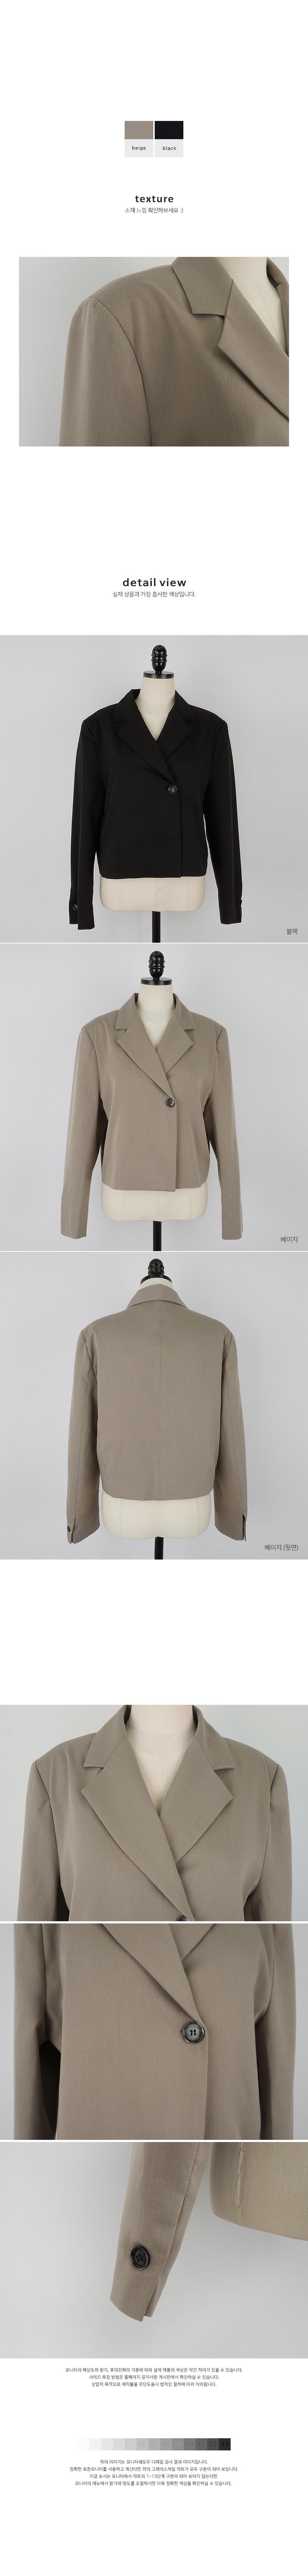 Rennes cropped jacket